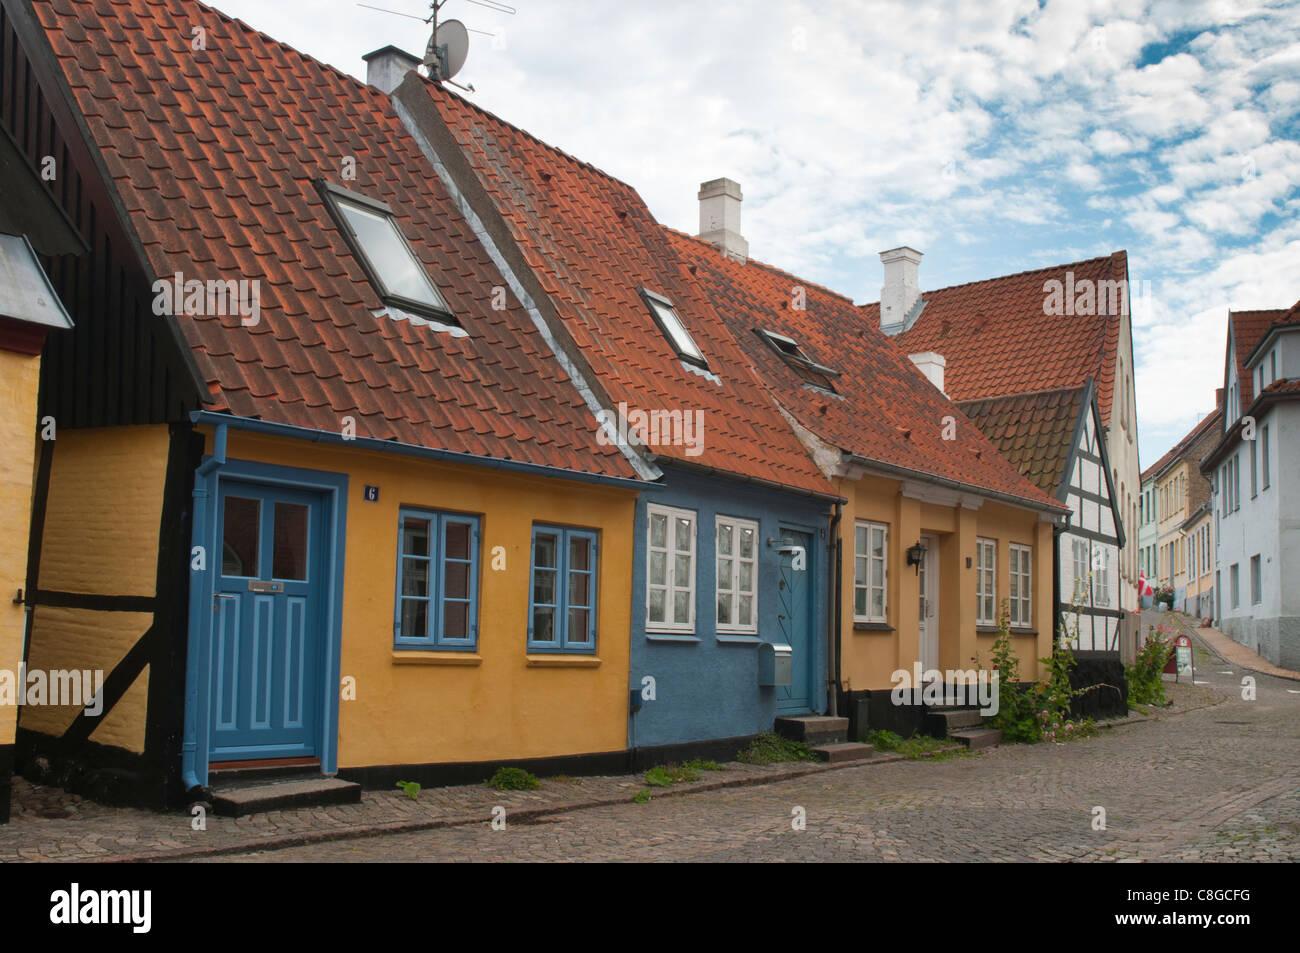 a*site:cheezepizza.blogspot.com ls-island Alley in Sonderborg, South Denmark, Baltic Sea, <b>Als Island</b>, Denmark Europe <b>...</b>